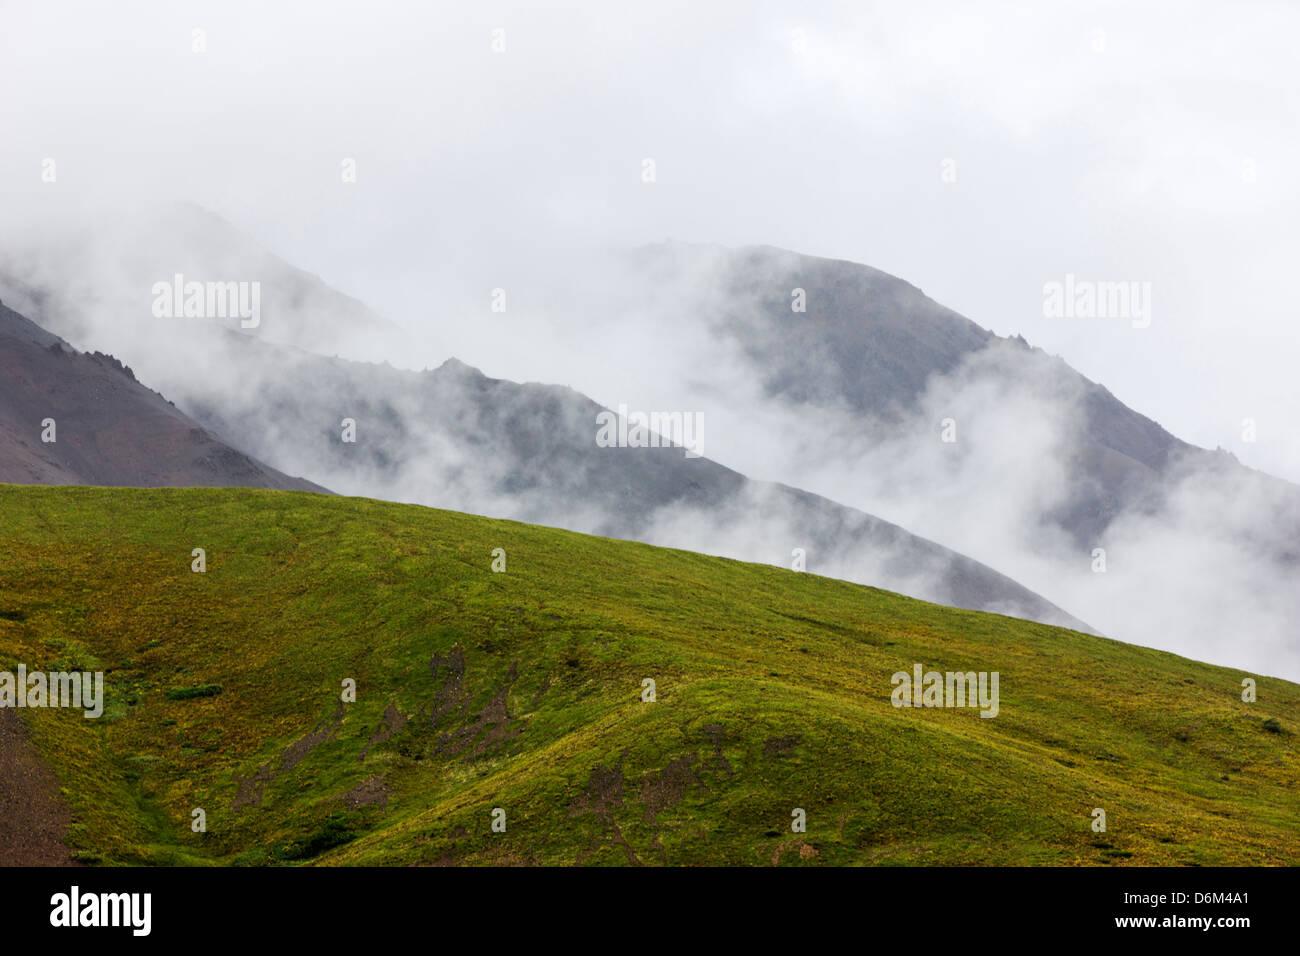 Misty foggy view south of the Alaska Range from Polychrome Pass, Denali National Park, Alaska, USA - Stock Image